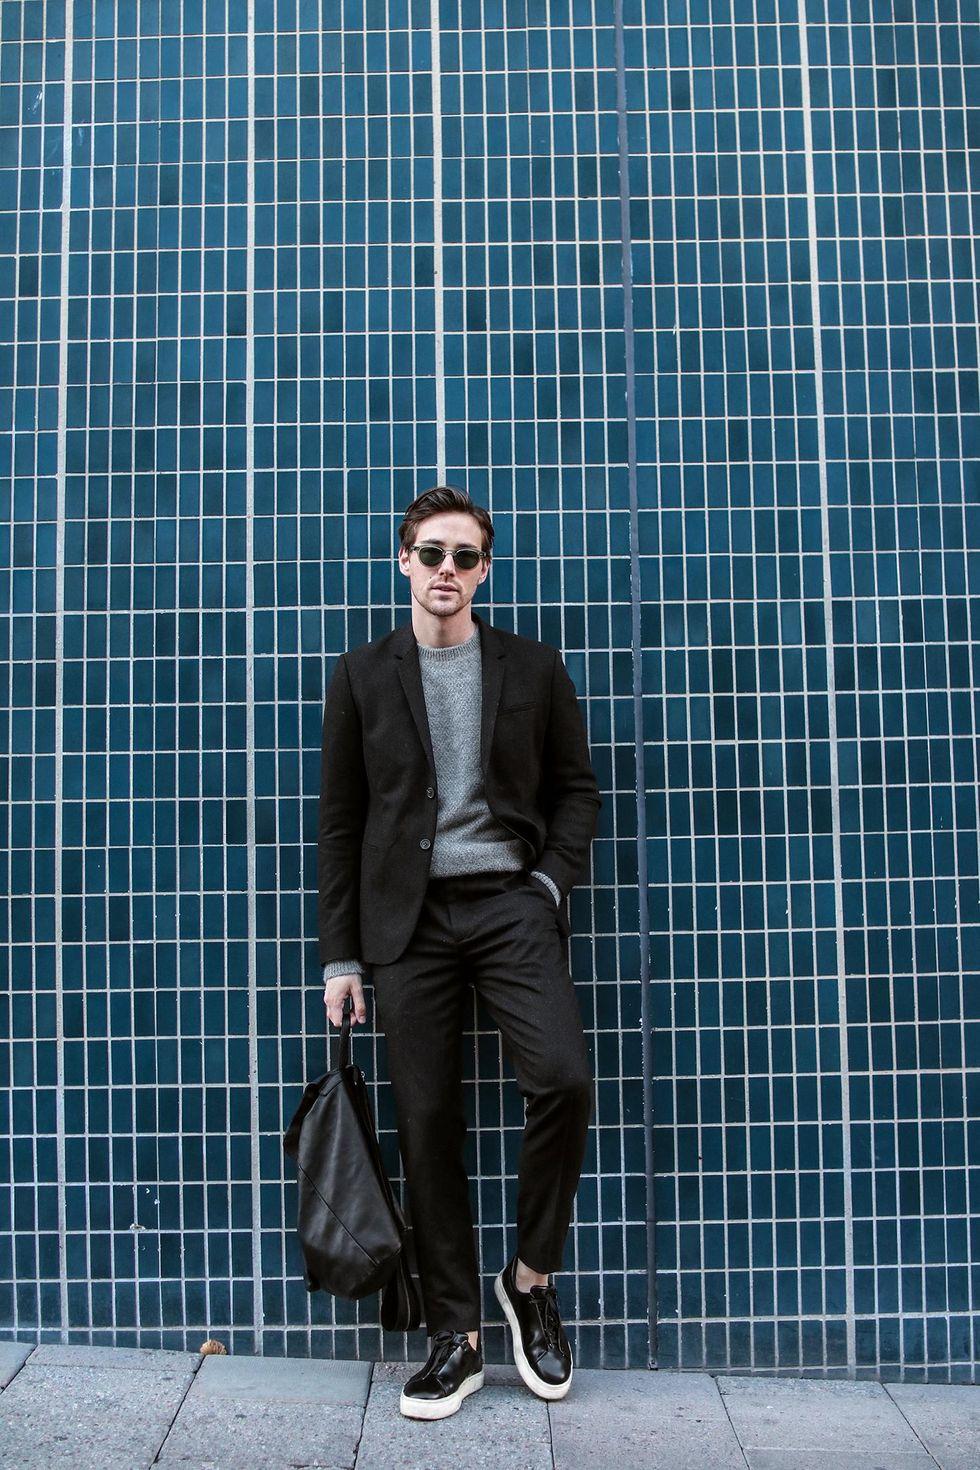 tobias sikström Mr Porter suit.jpg